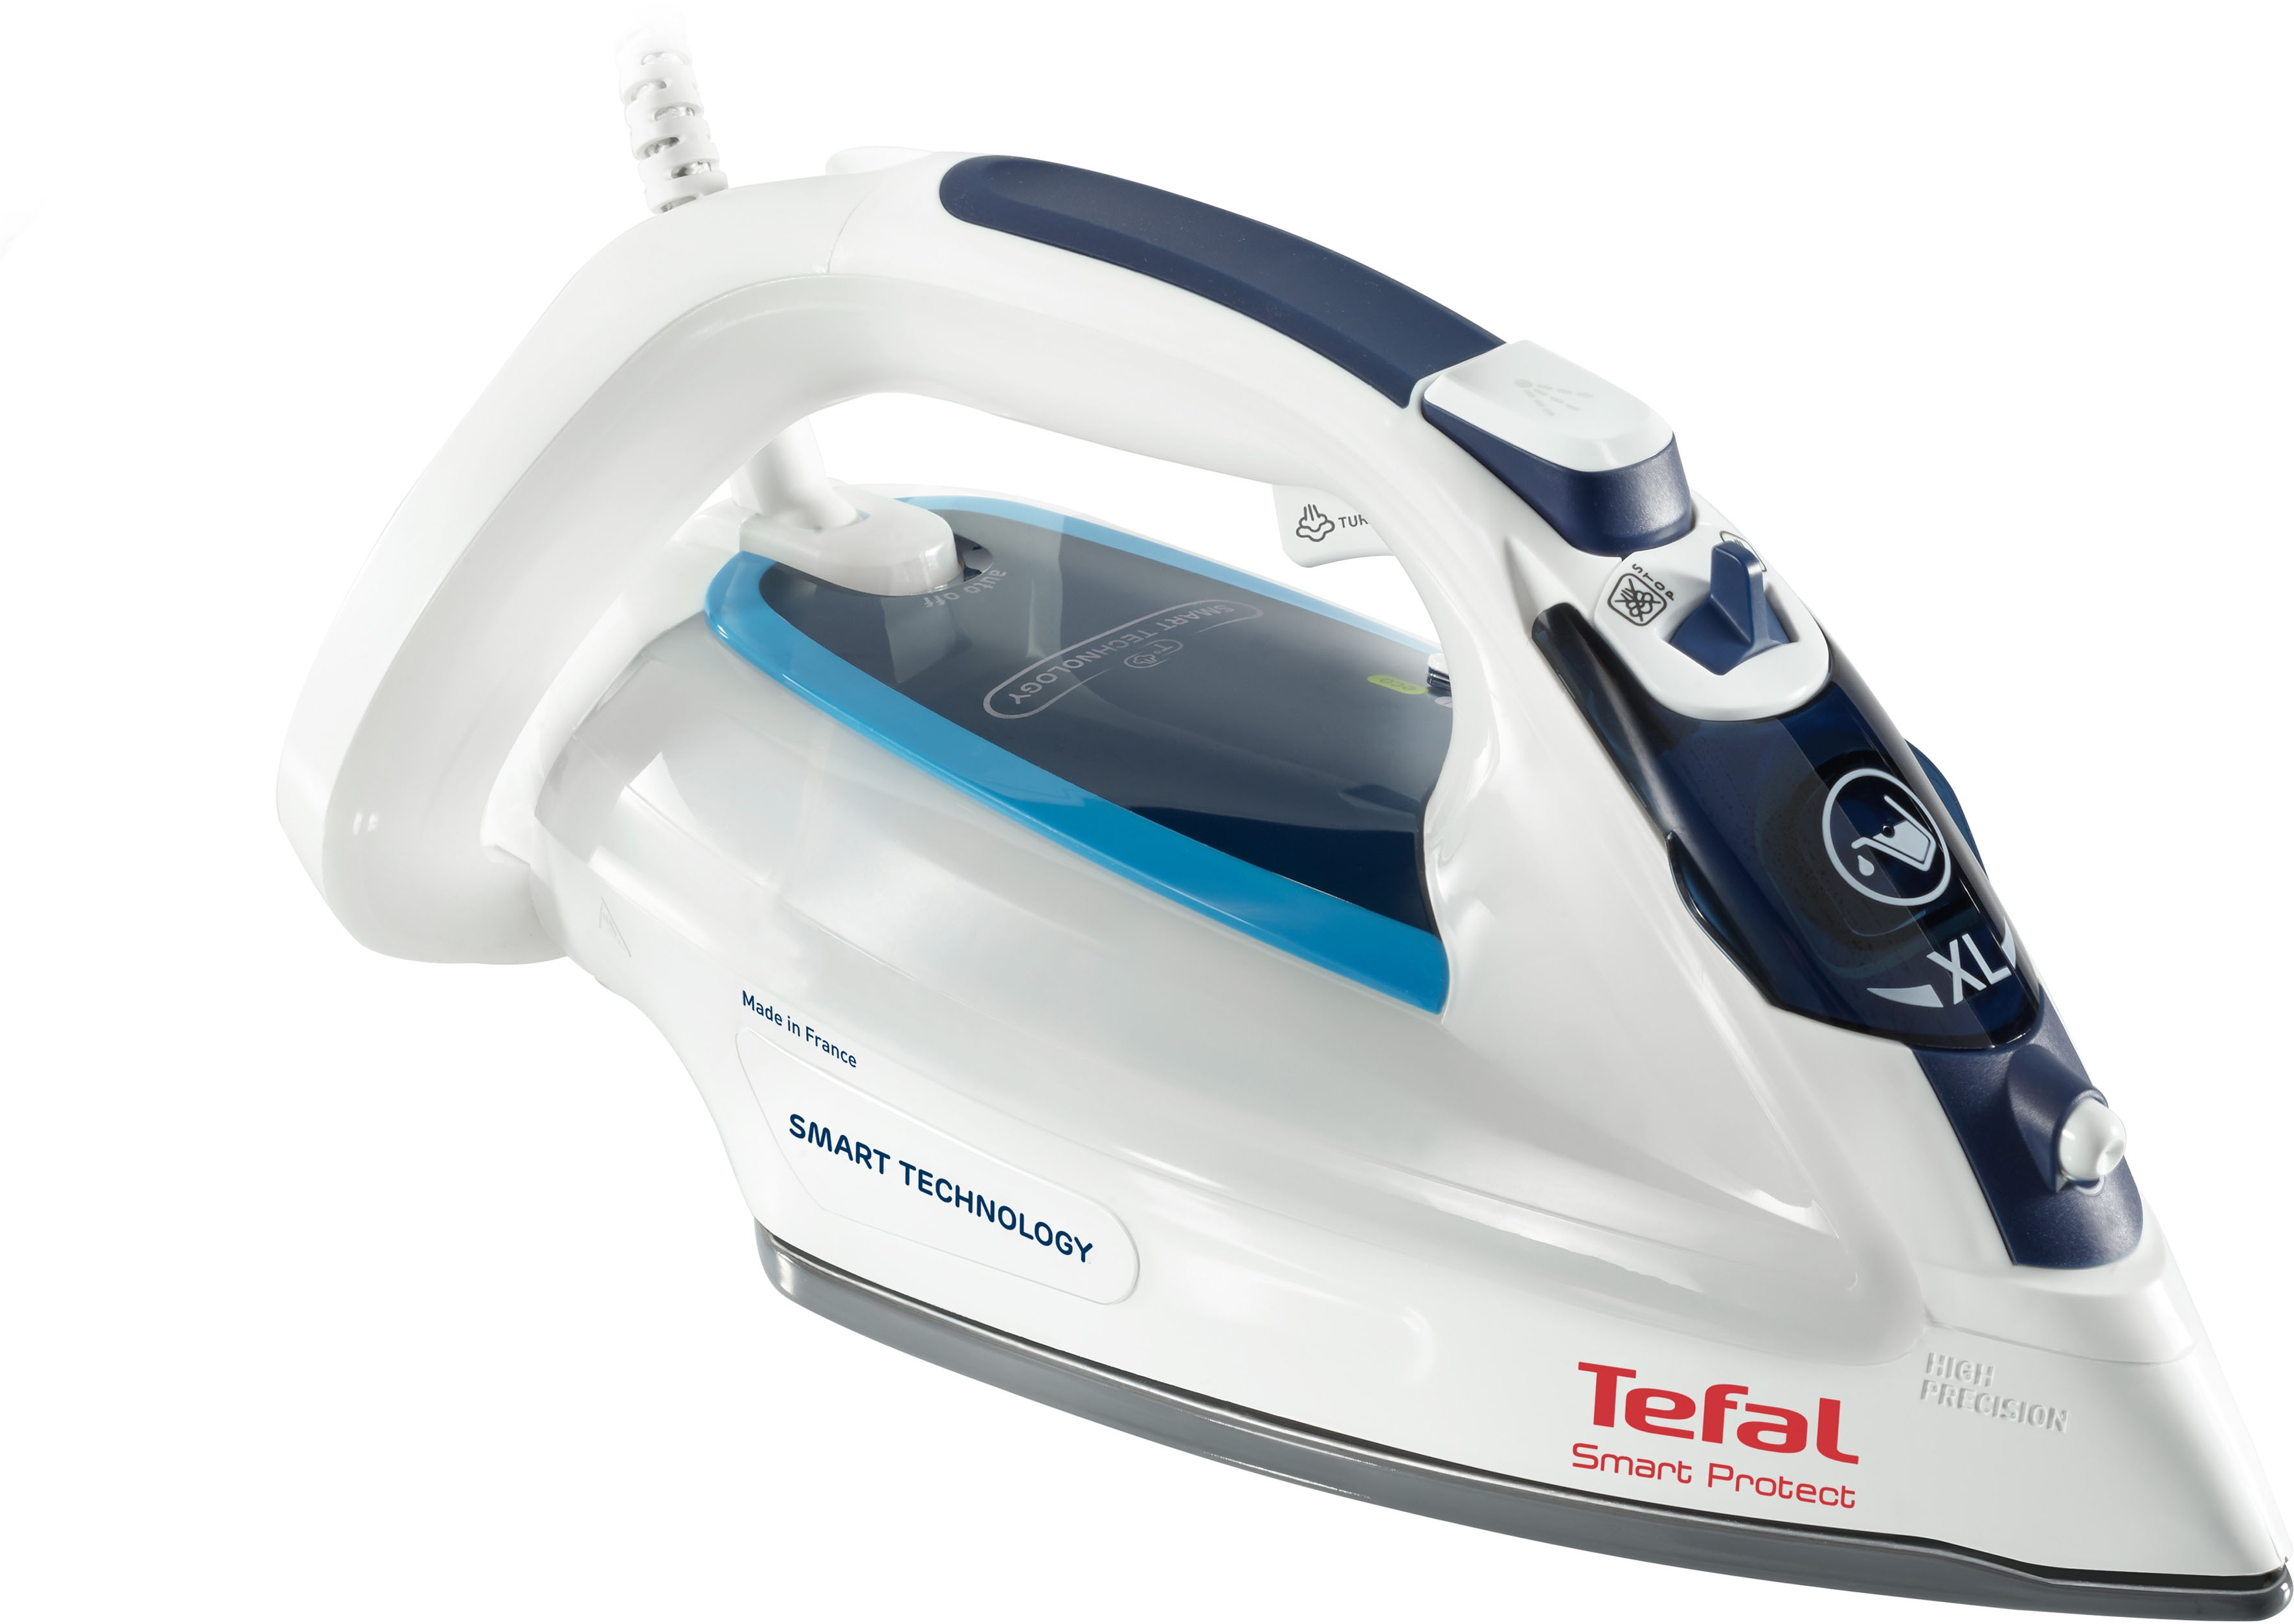 Tefal Dampfbügeleisen FV4980 Smart Protect, 2600 Watt, weiß